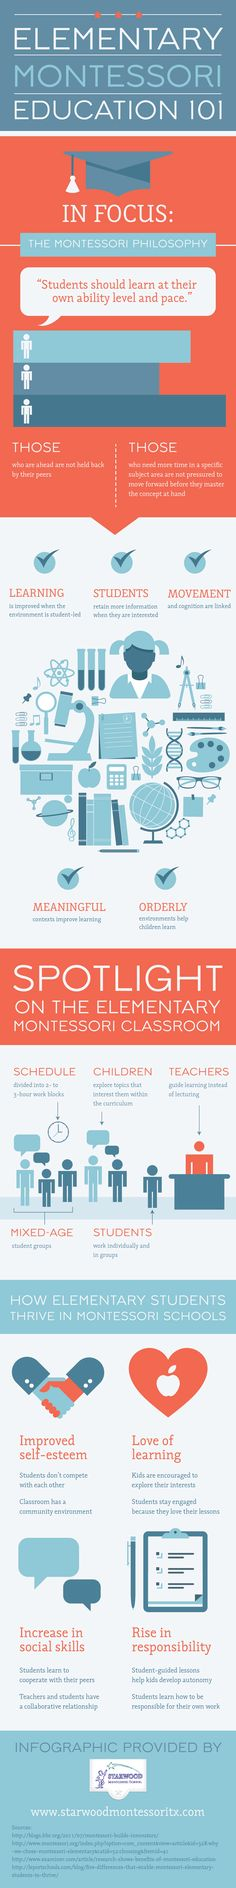 La educación según Montessori #infografia #infographic #education http://ticsyformacion.com/2014/09/12/la-educacion-segun-montessori-infografia-infographic-education/